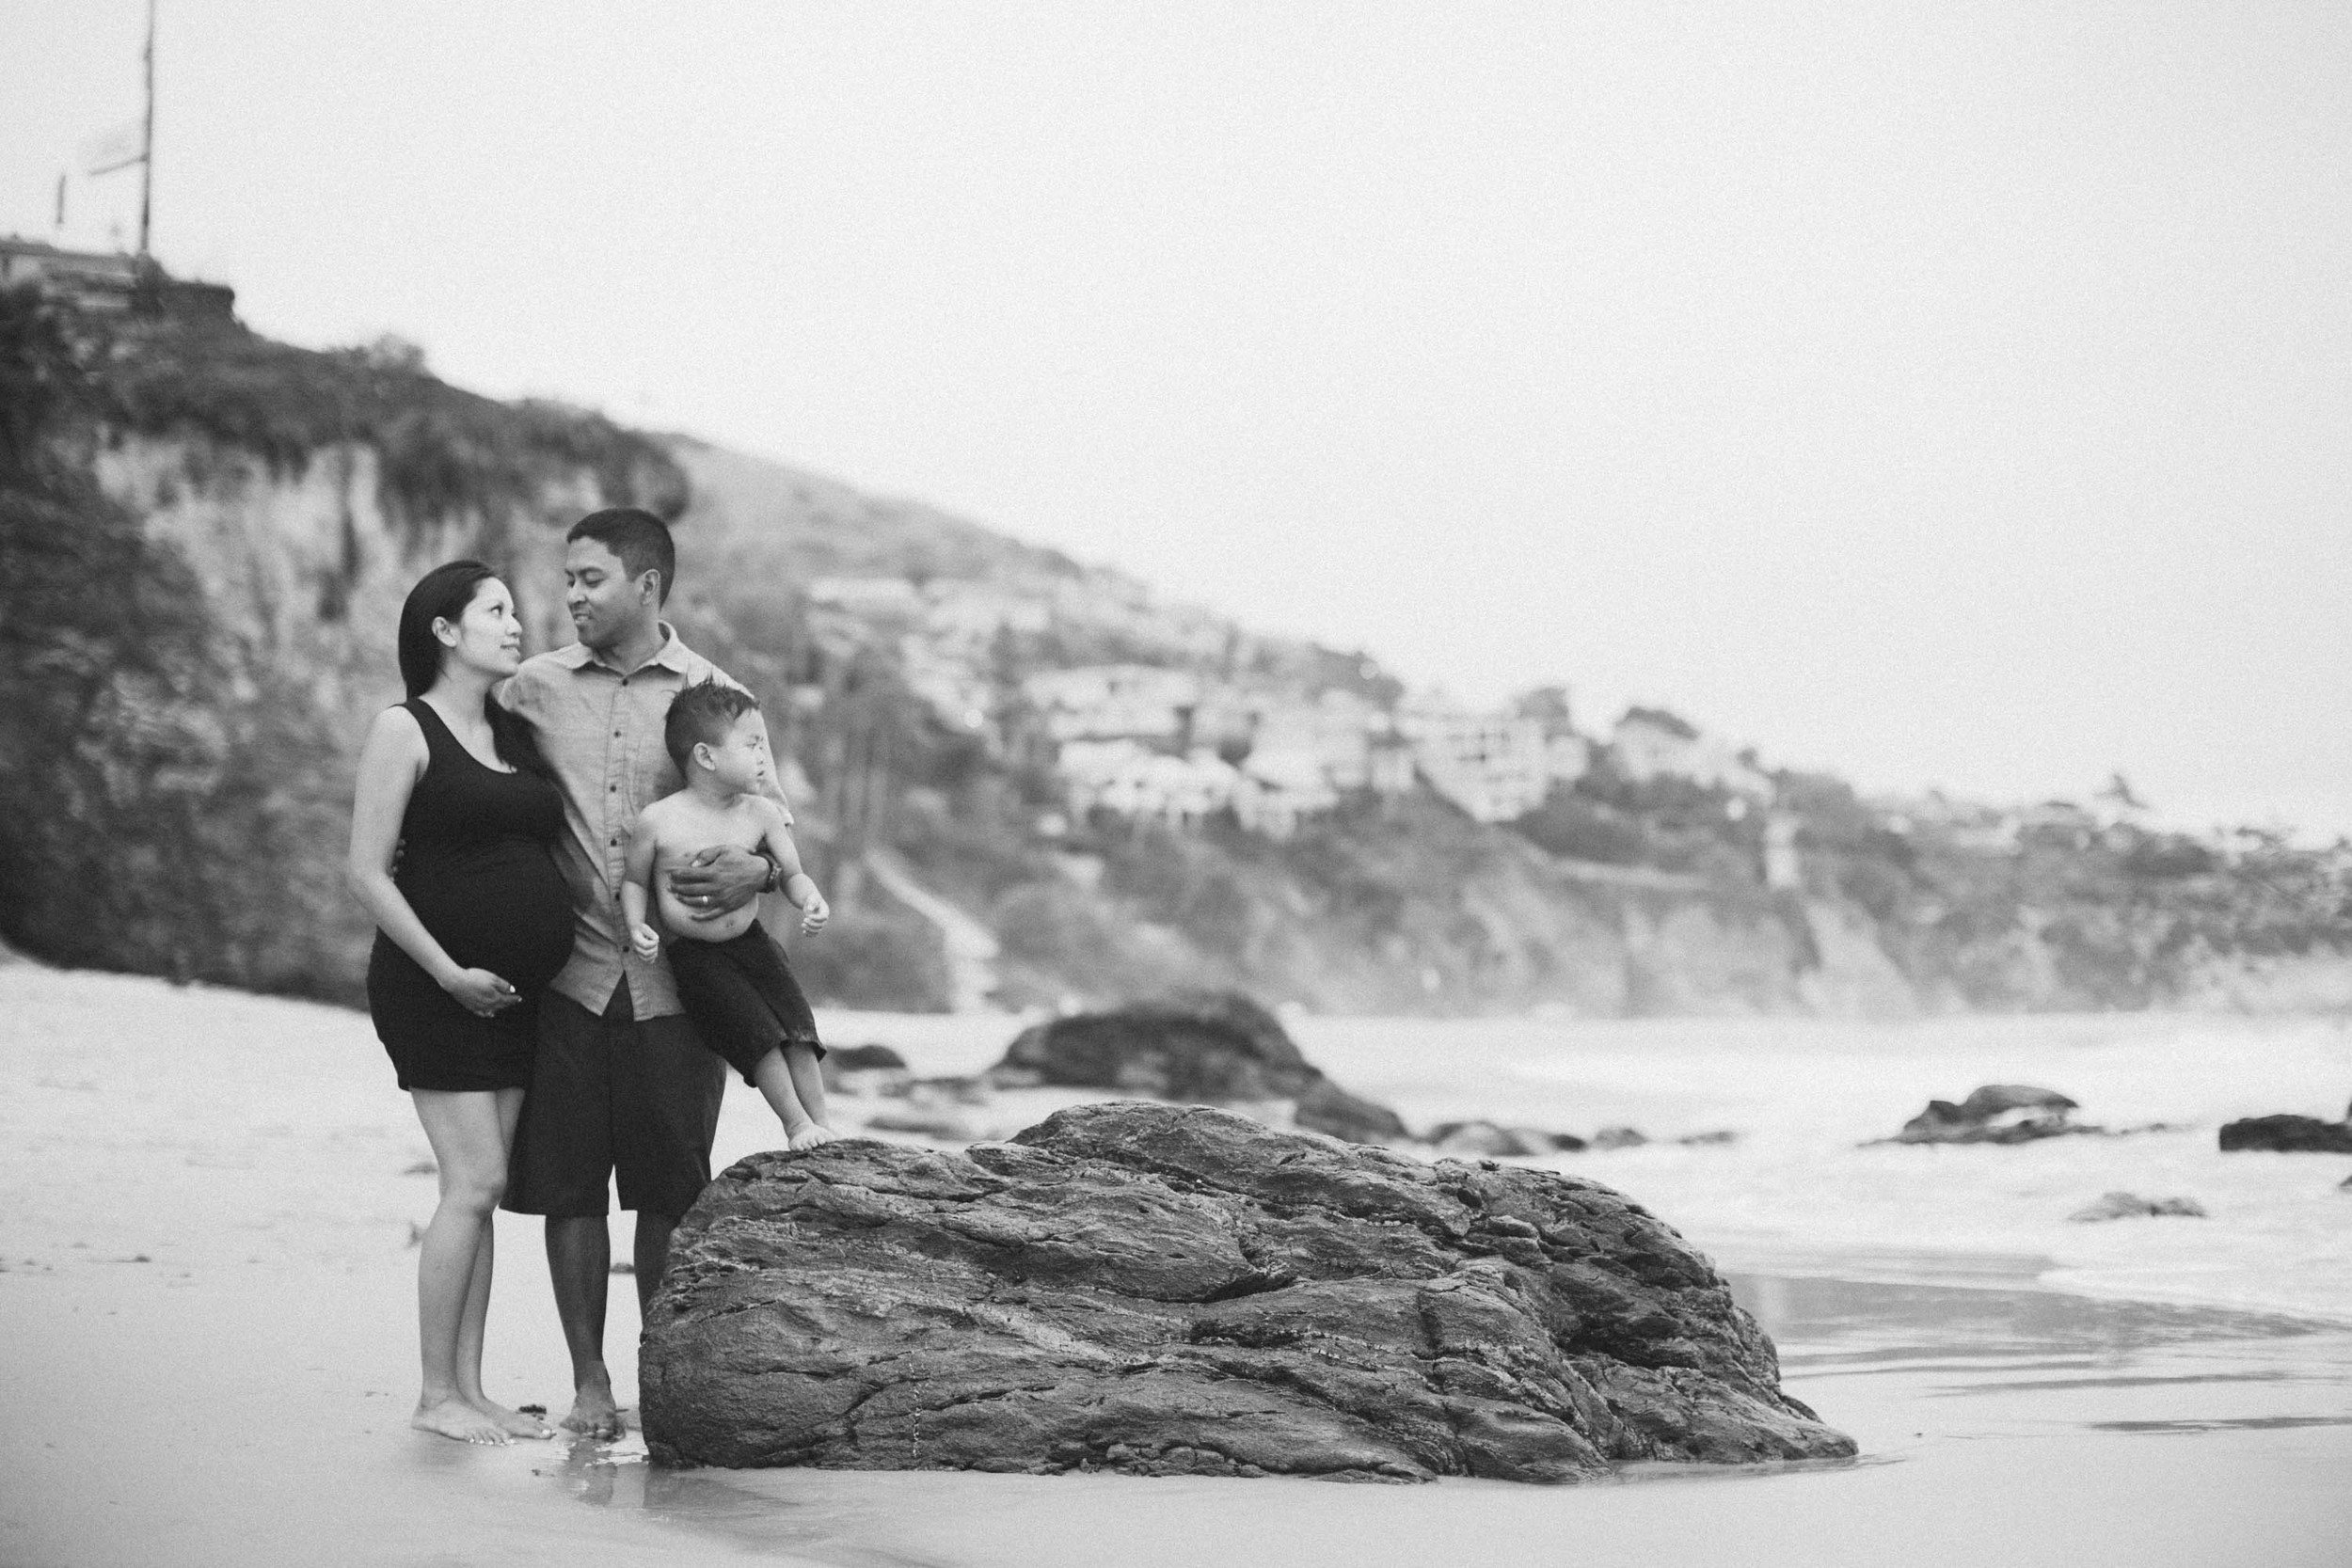 Joy_Maternity_LagunaBeach_BrandonJFerlinPhotography-55.jpg